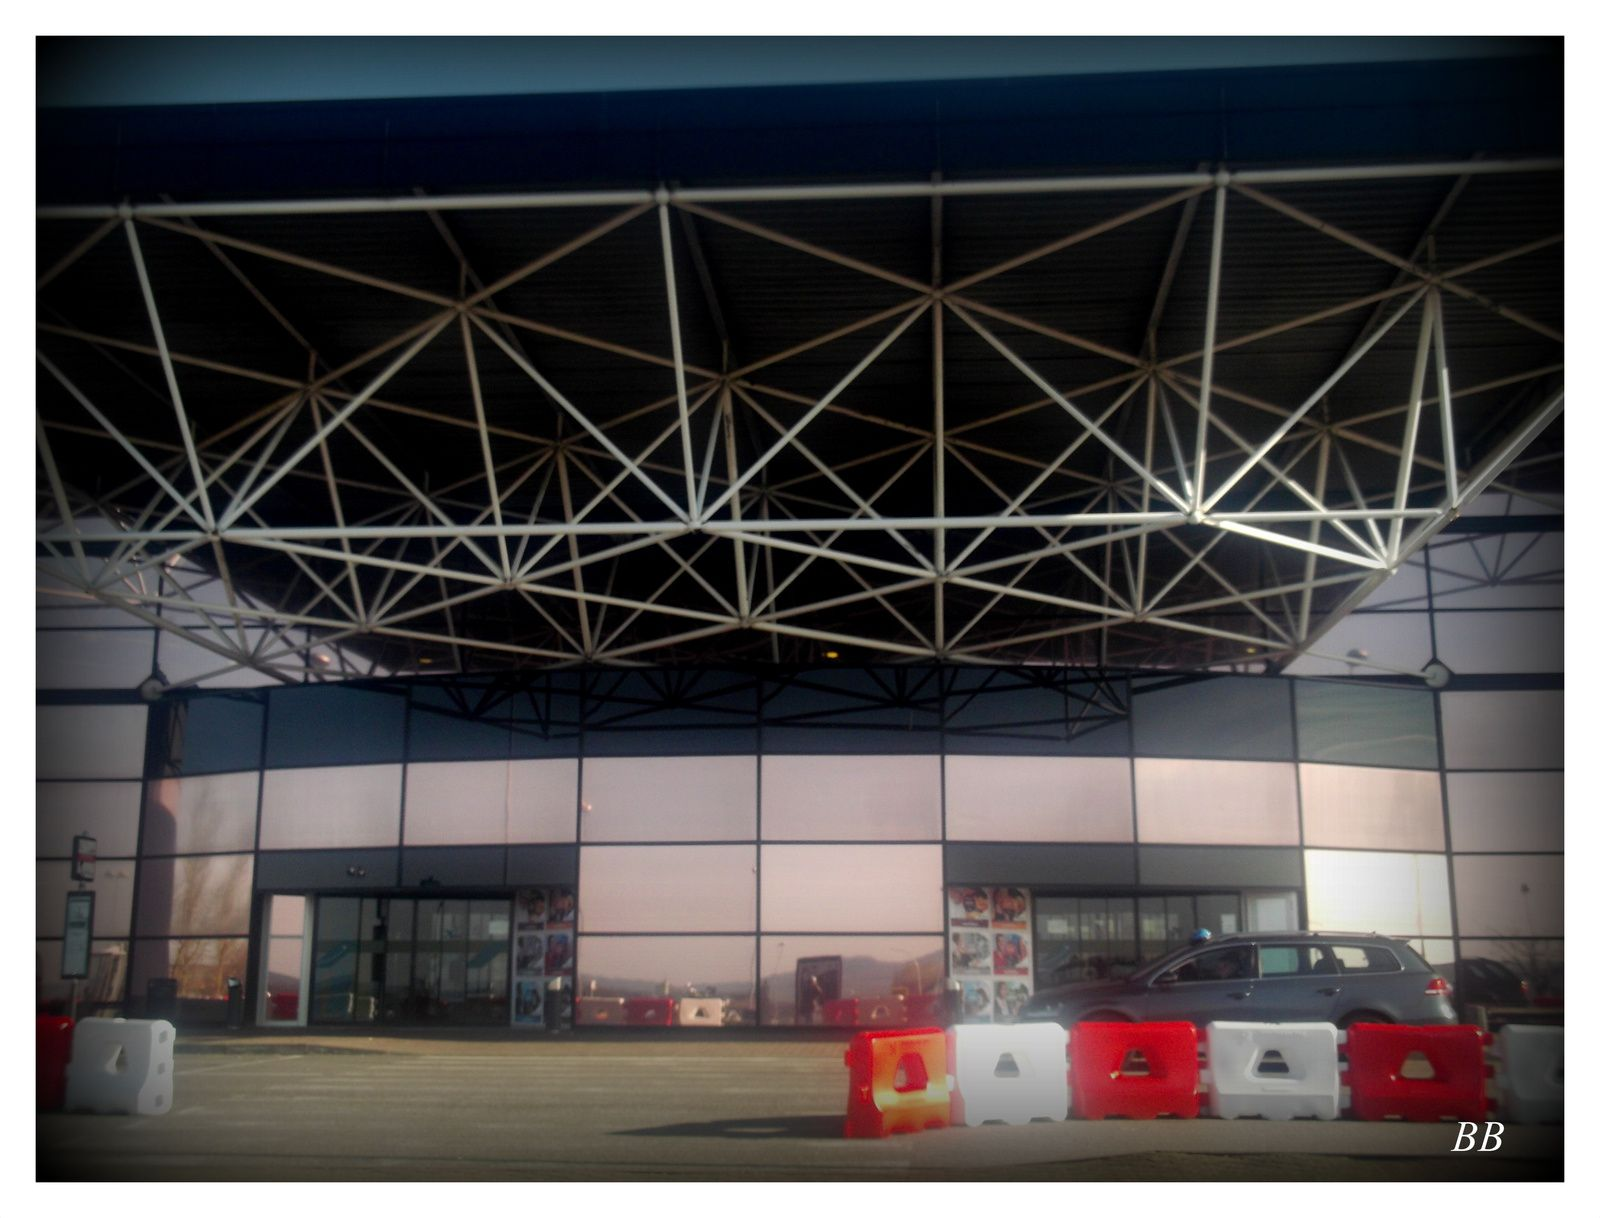 Aéroport de Metz-Nancy-Lorraine